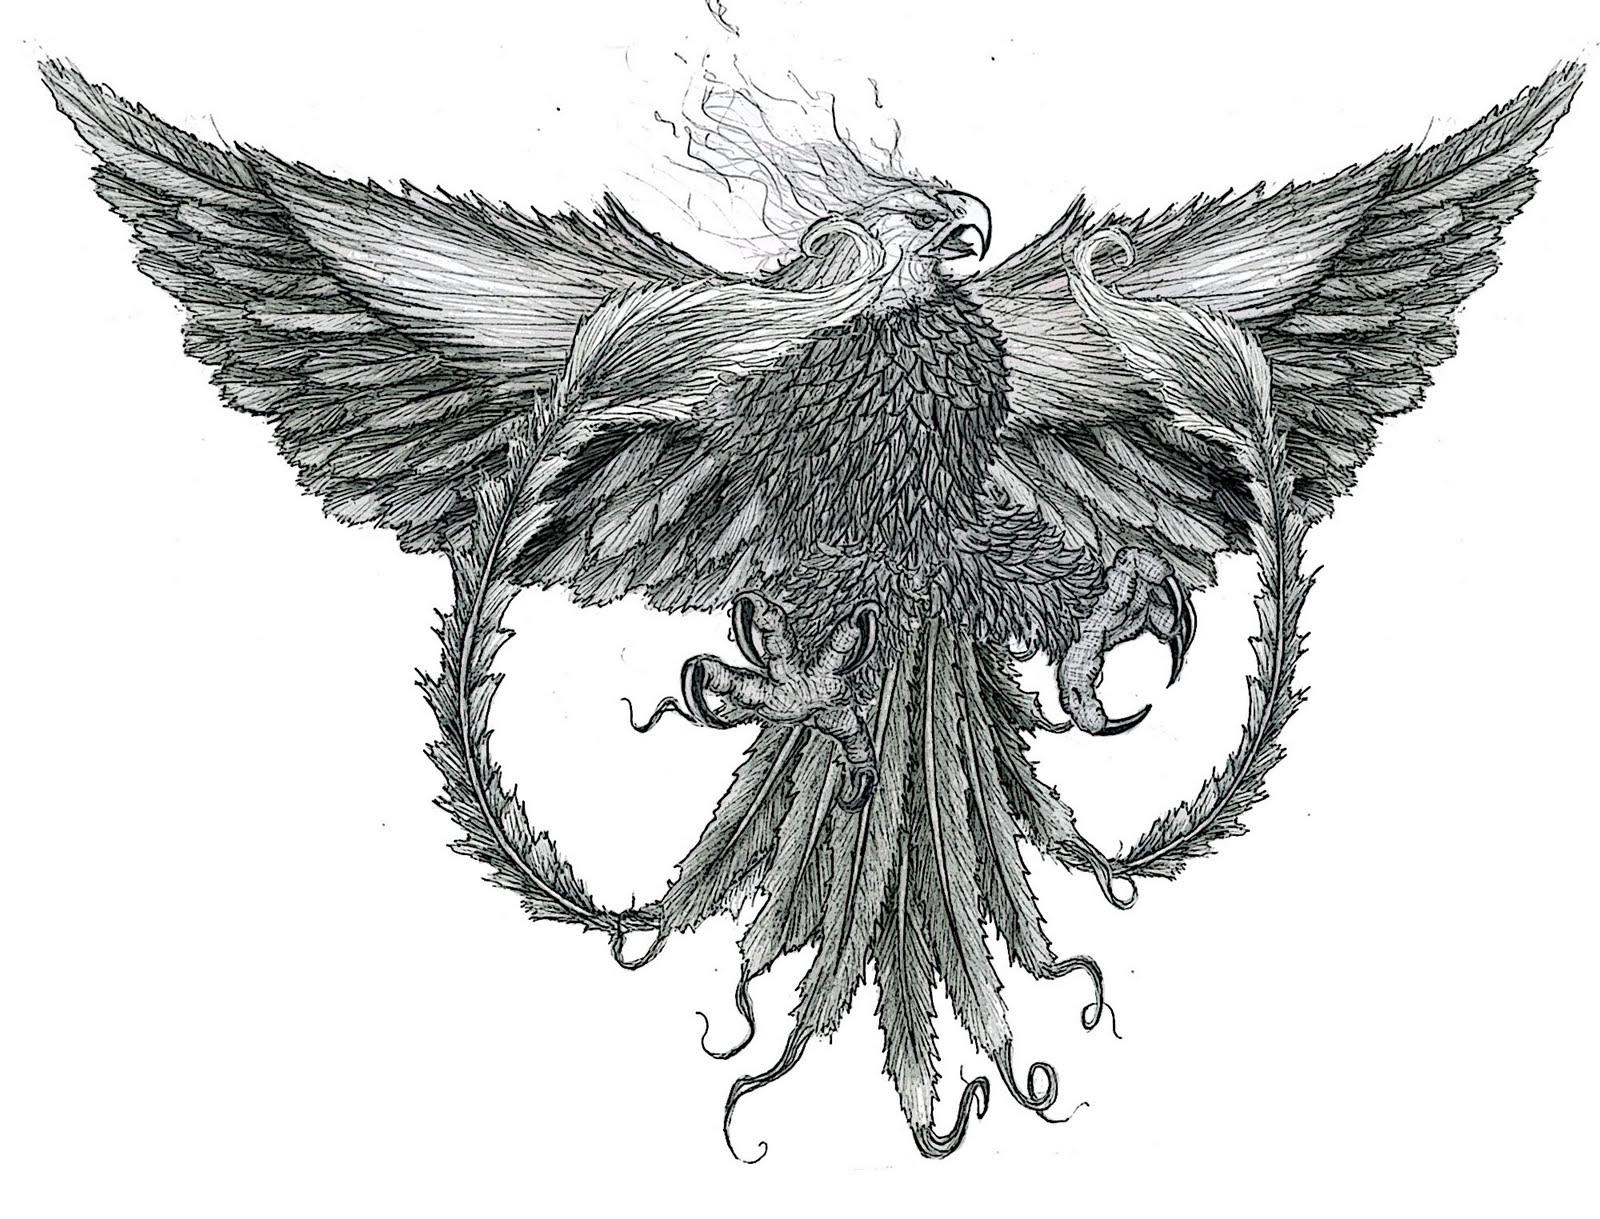 Phoenix tattoo for men - Phoenix Tattoos For Men